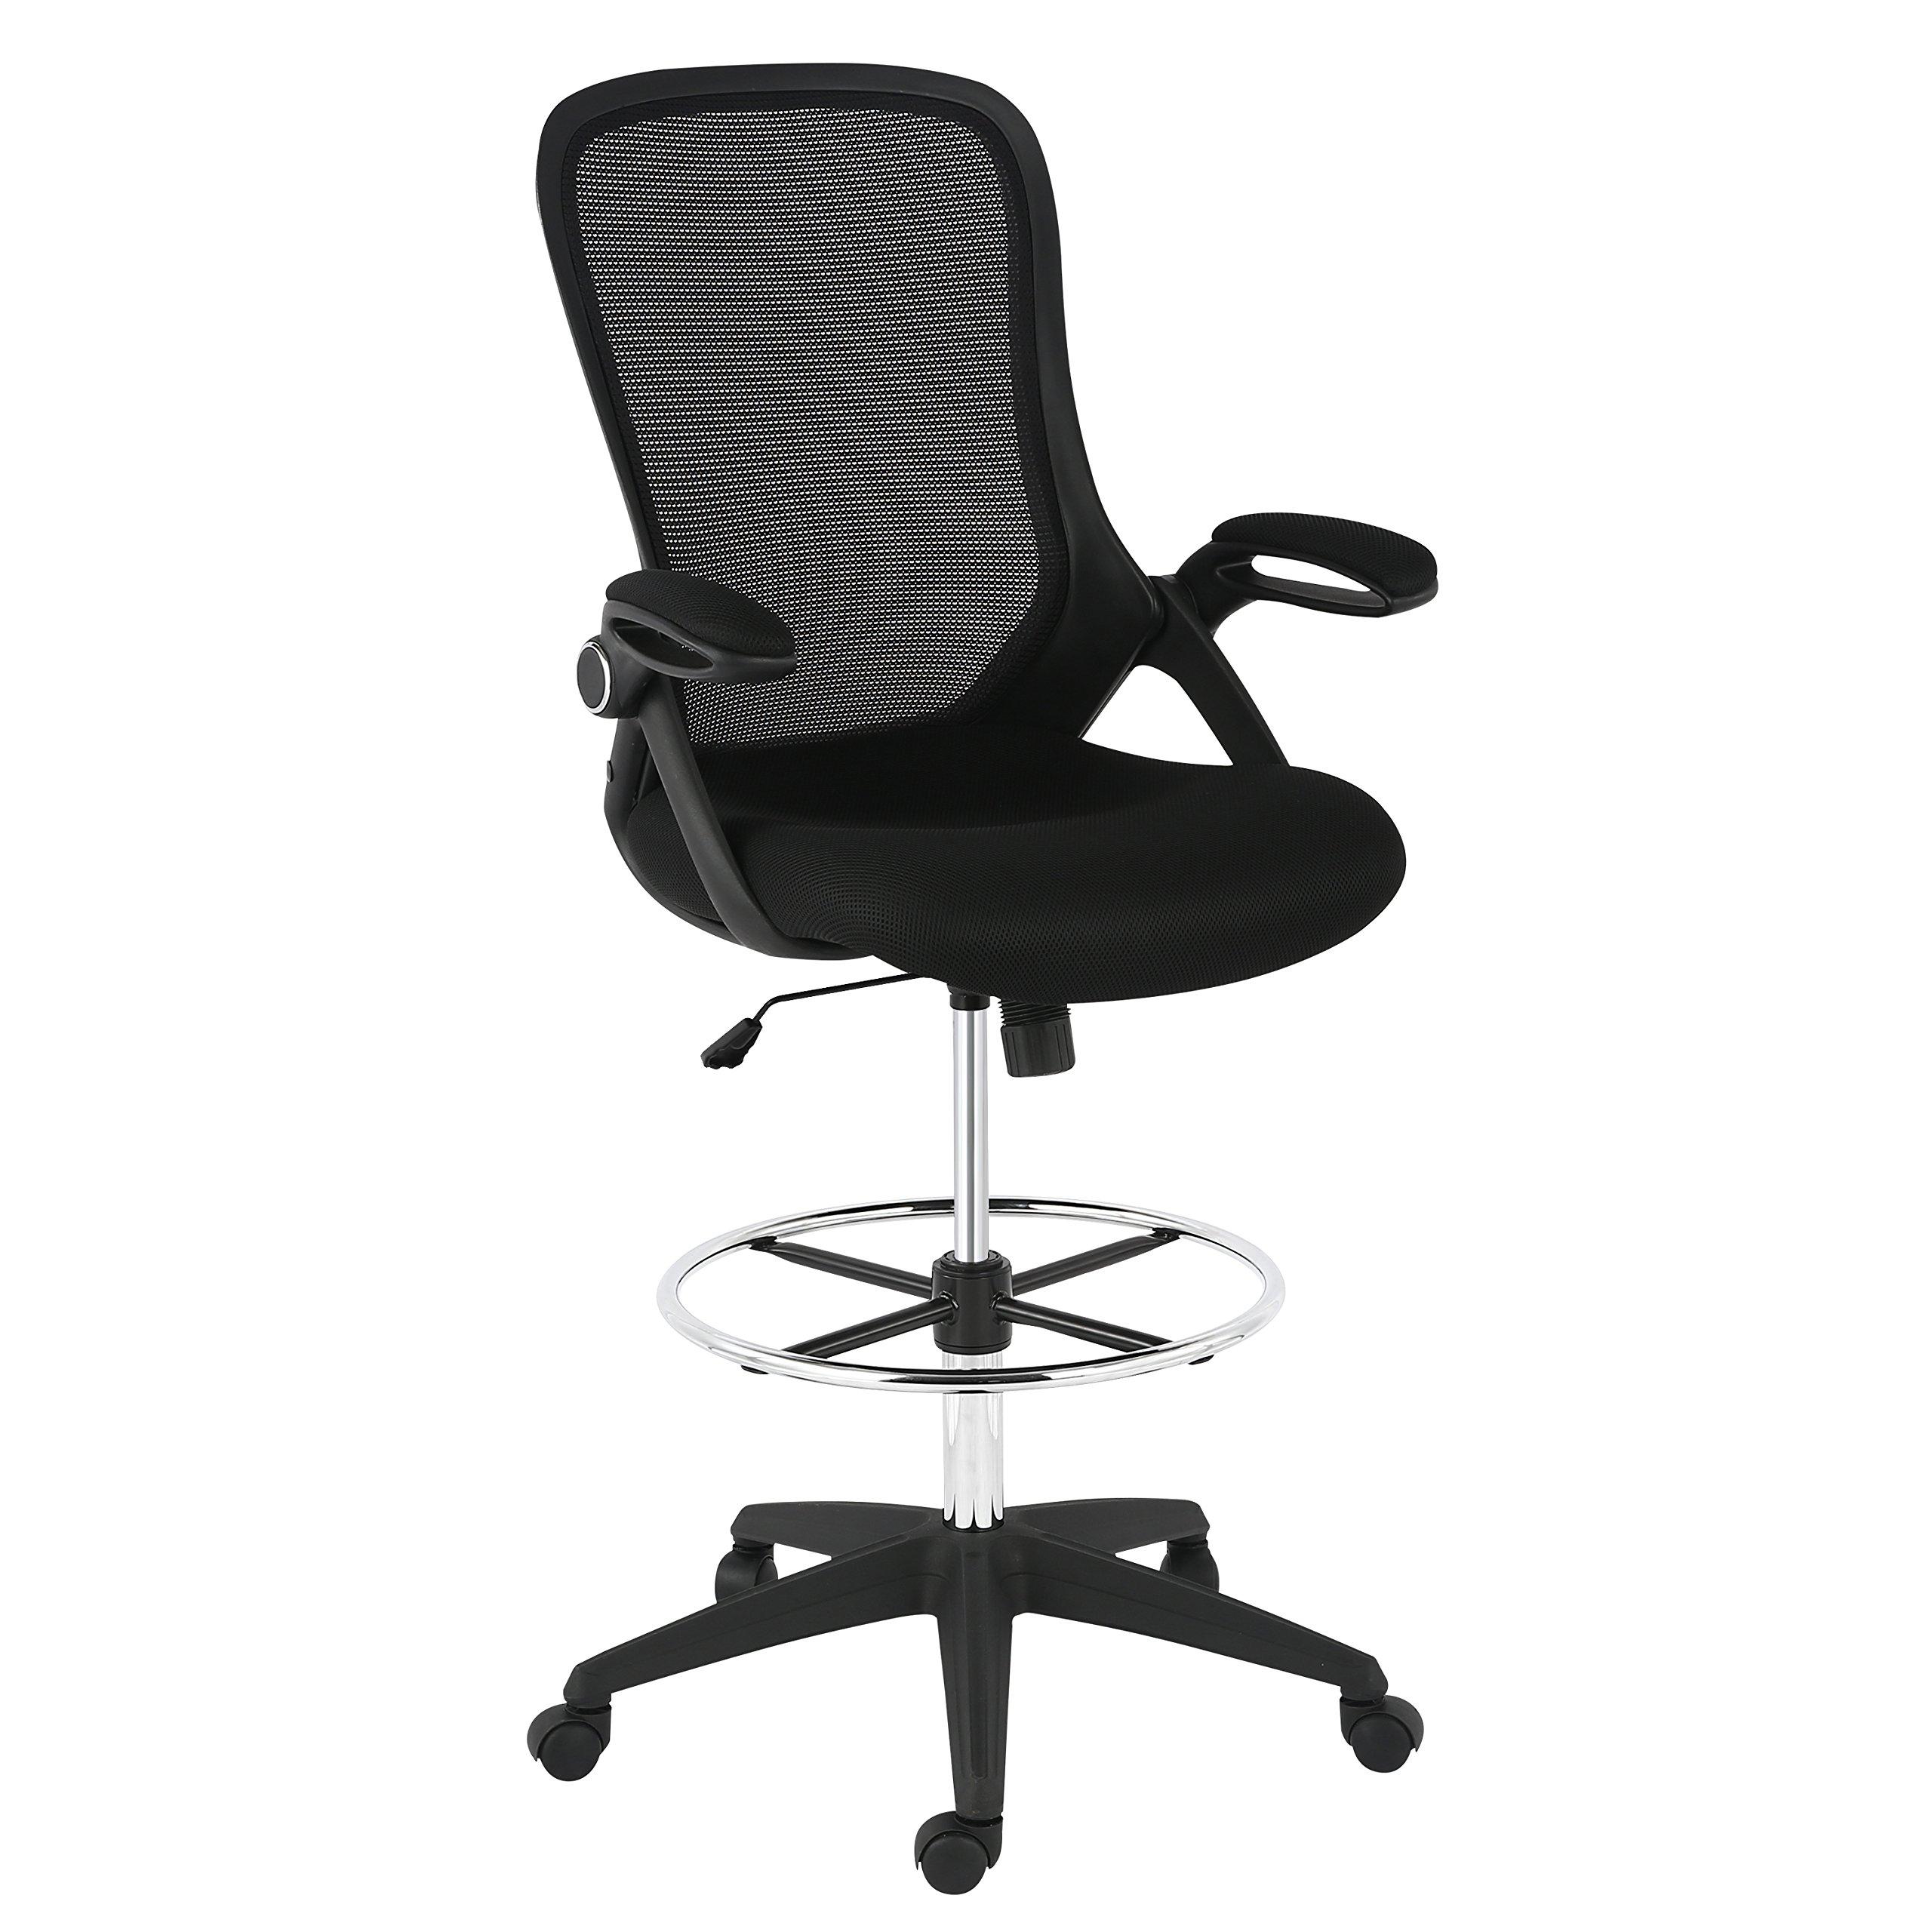 POLY BARK EM 370 BLK Drafting Chair